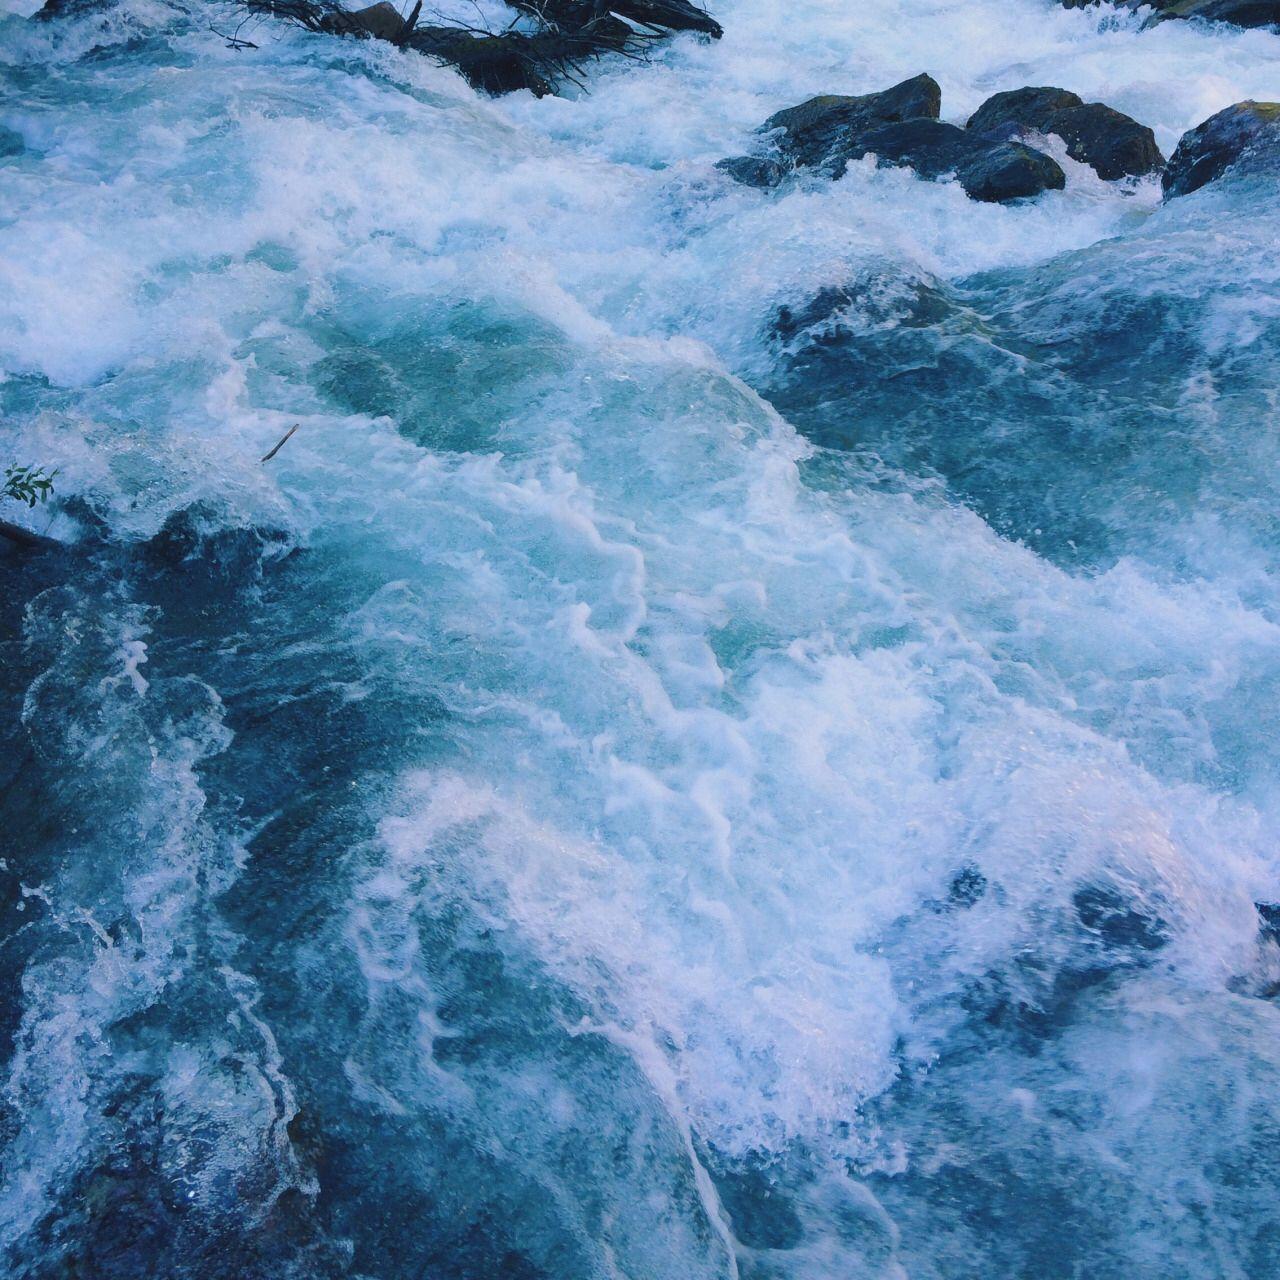 Aesthetic Blue Wave Wallpaper